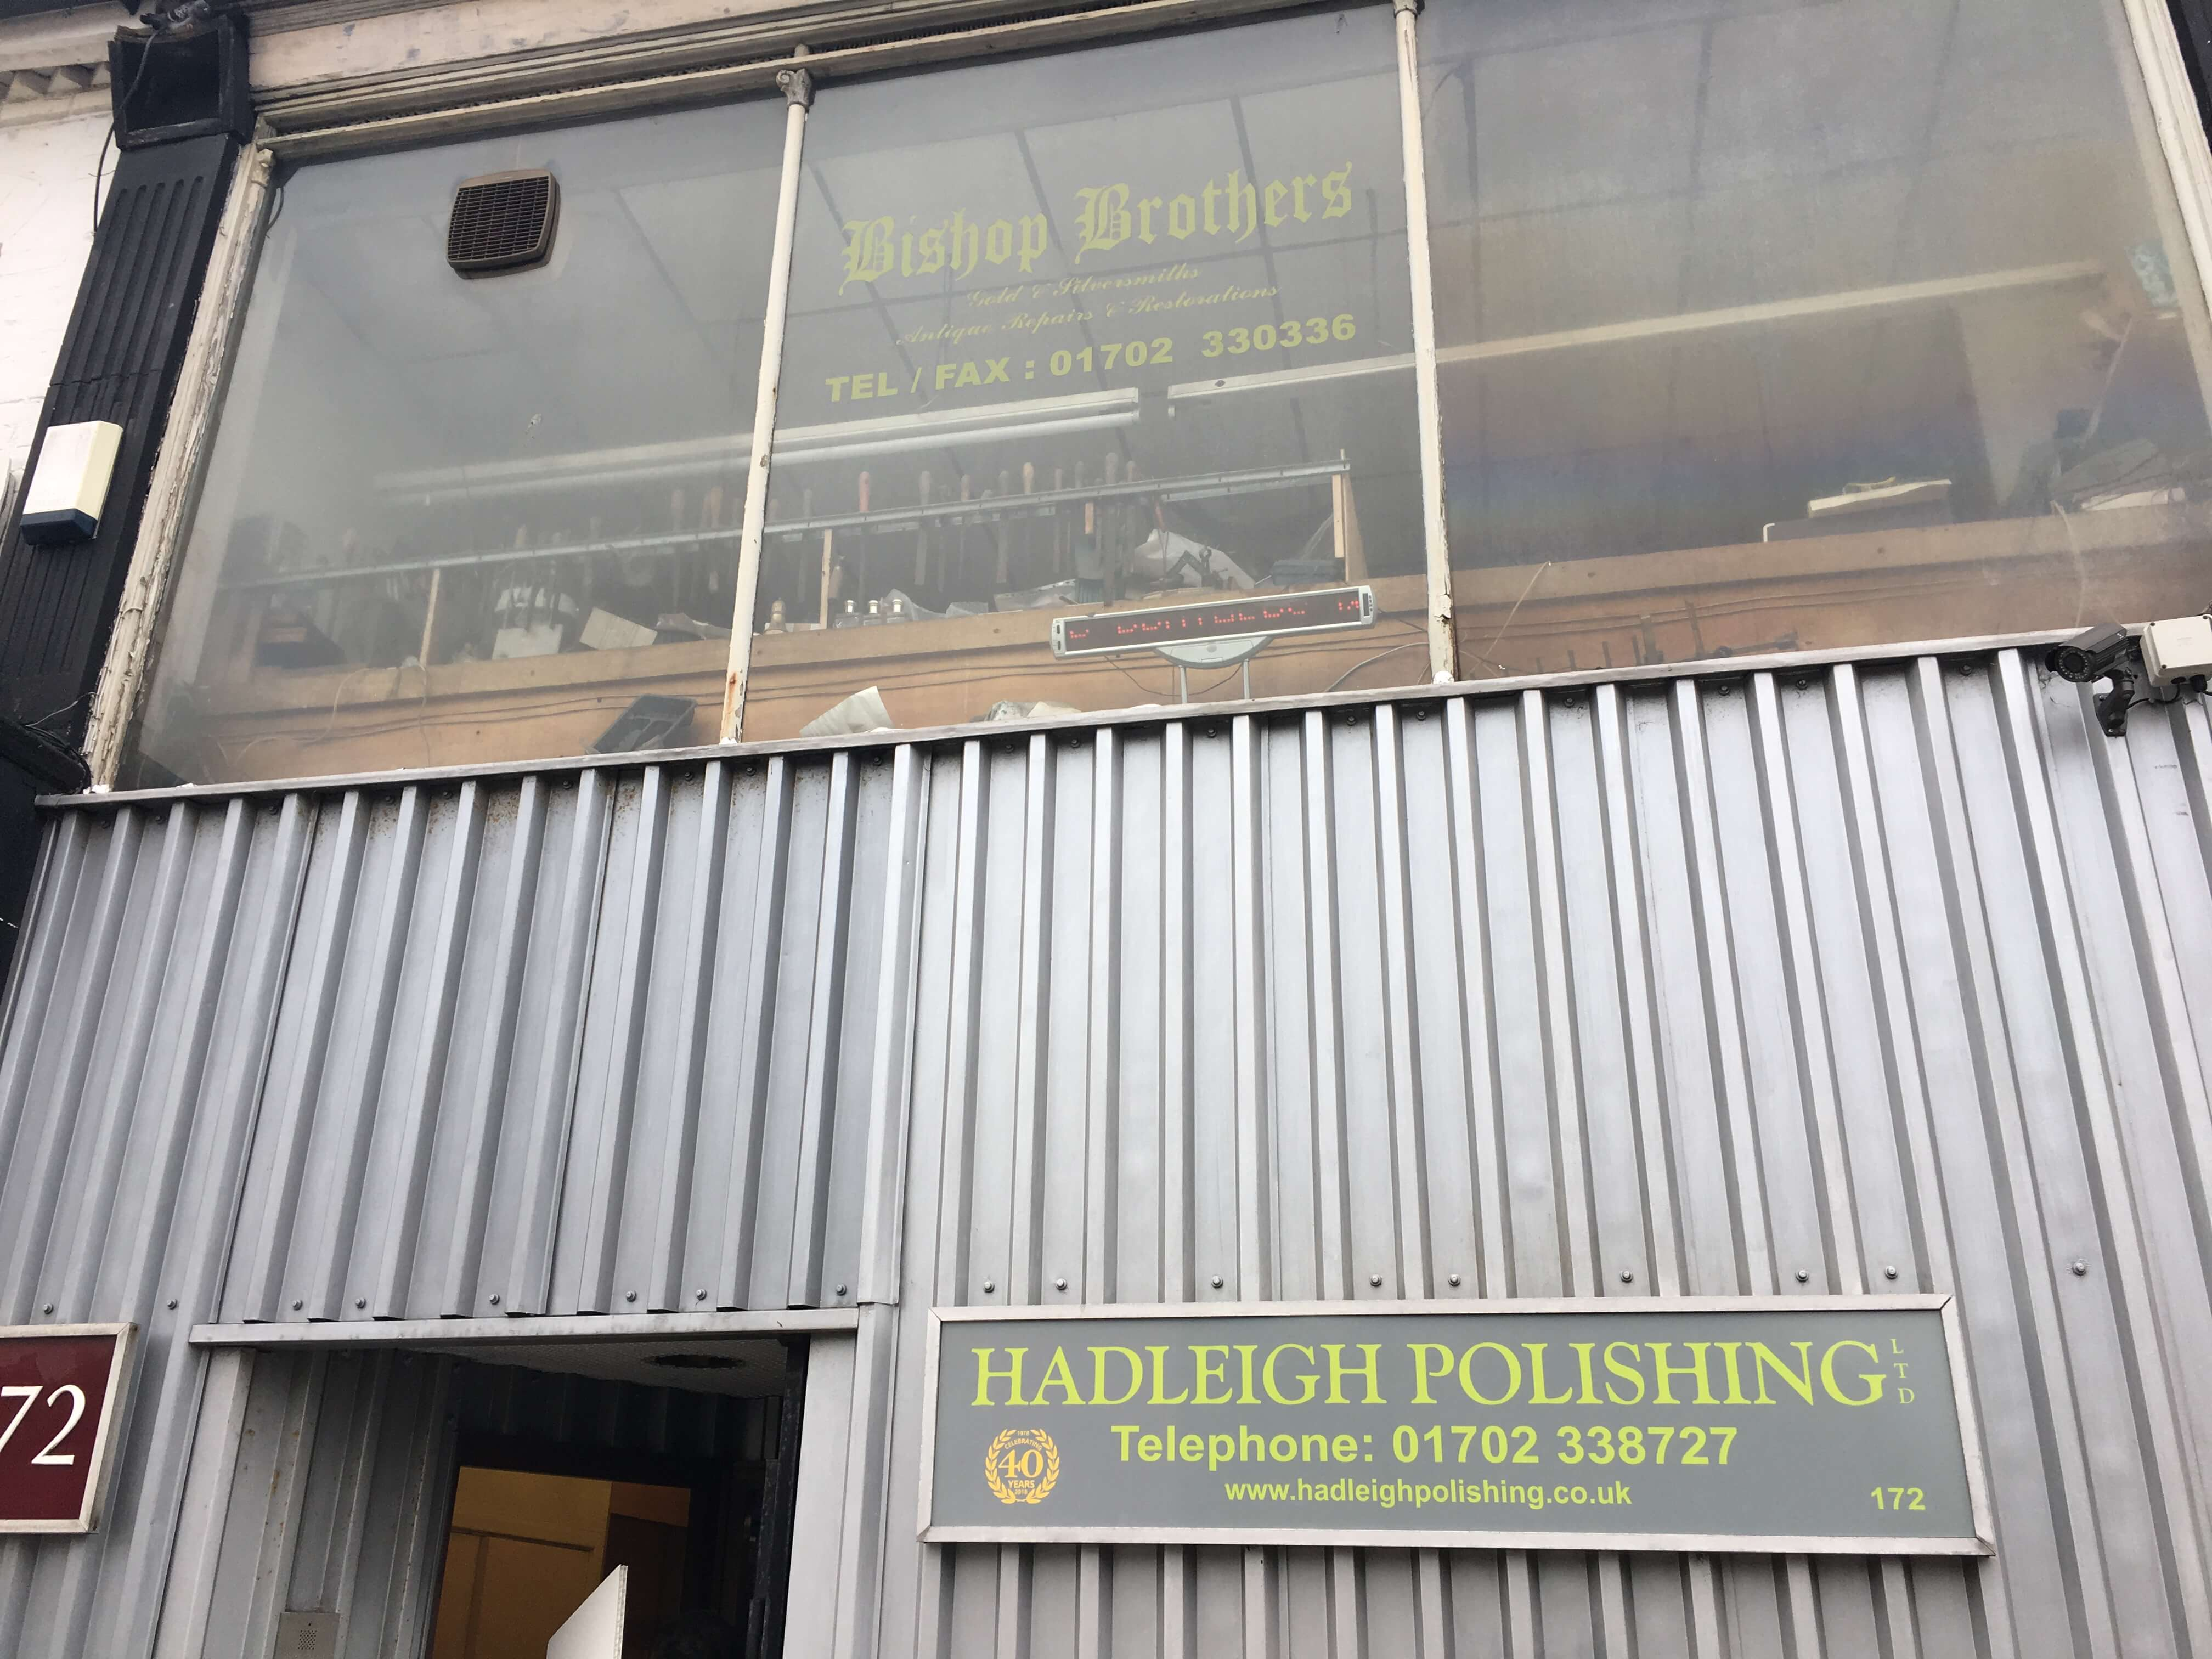 Hadleigh polishing